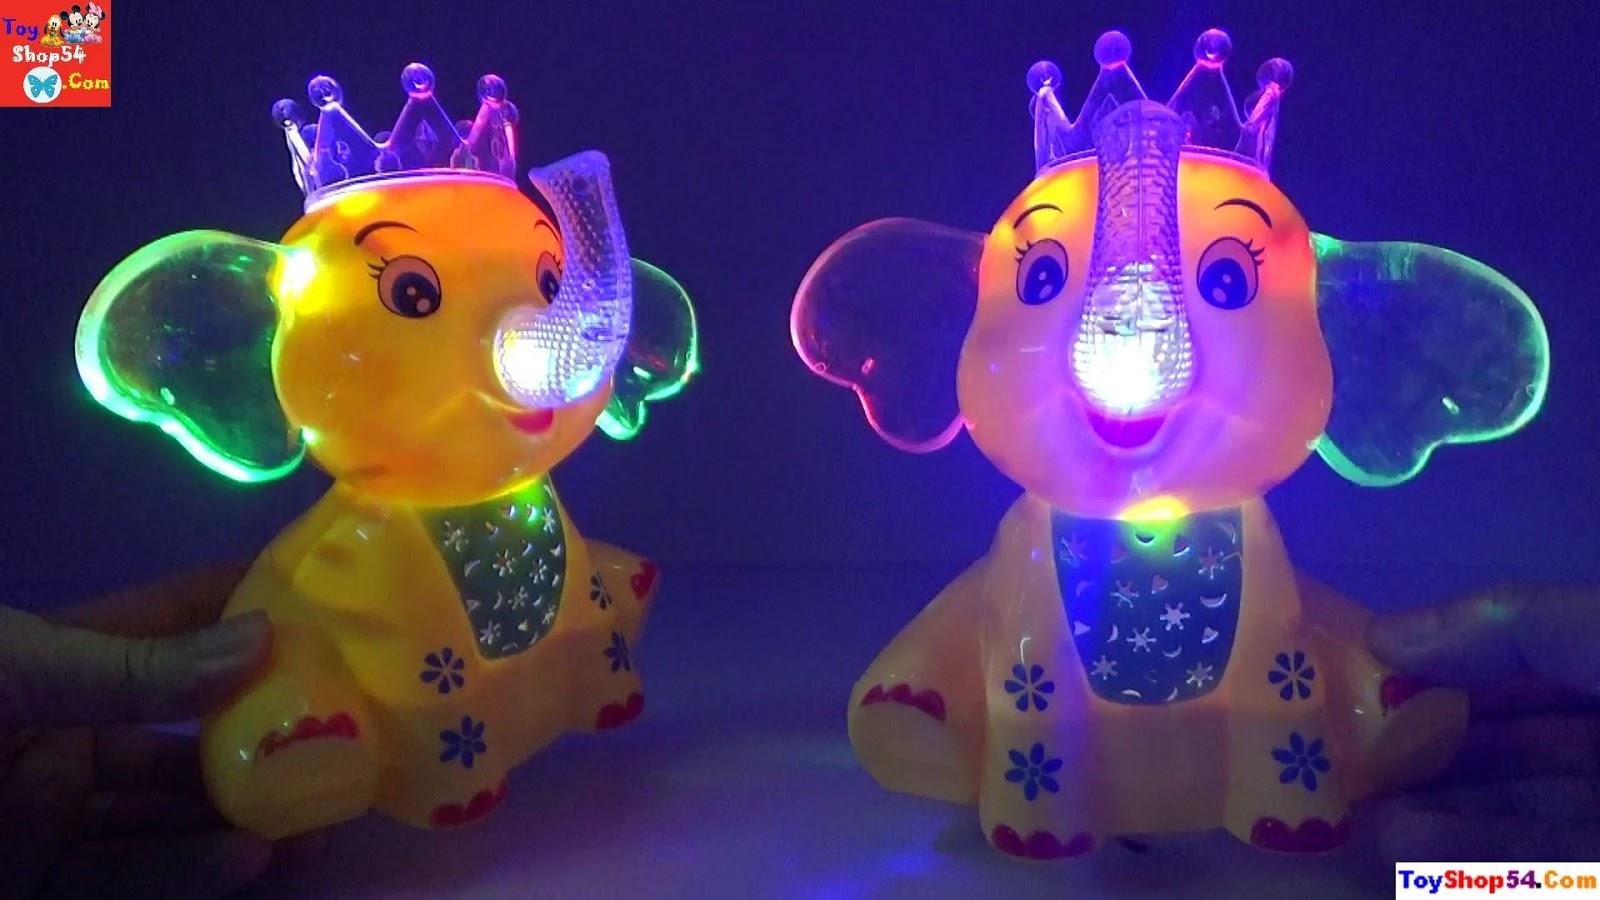 Tumblr Fondos De Pantalla De Navidad: Fondo De Pantalla Elefantes